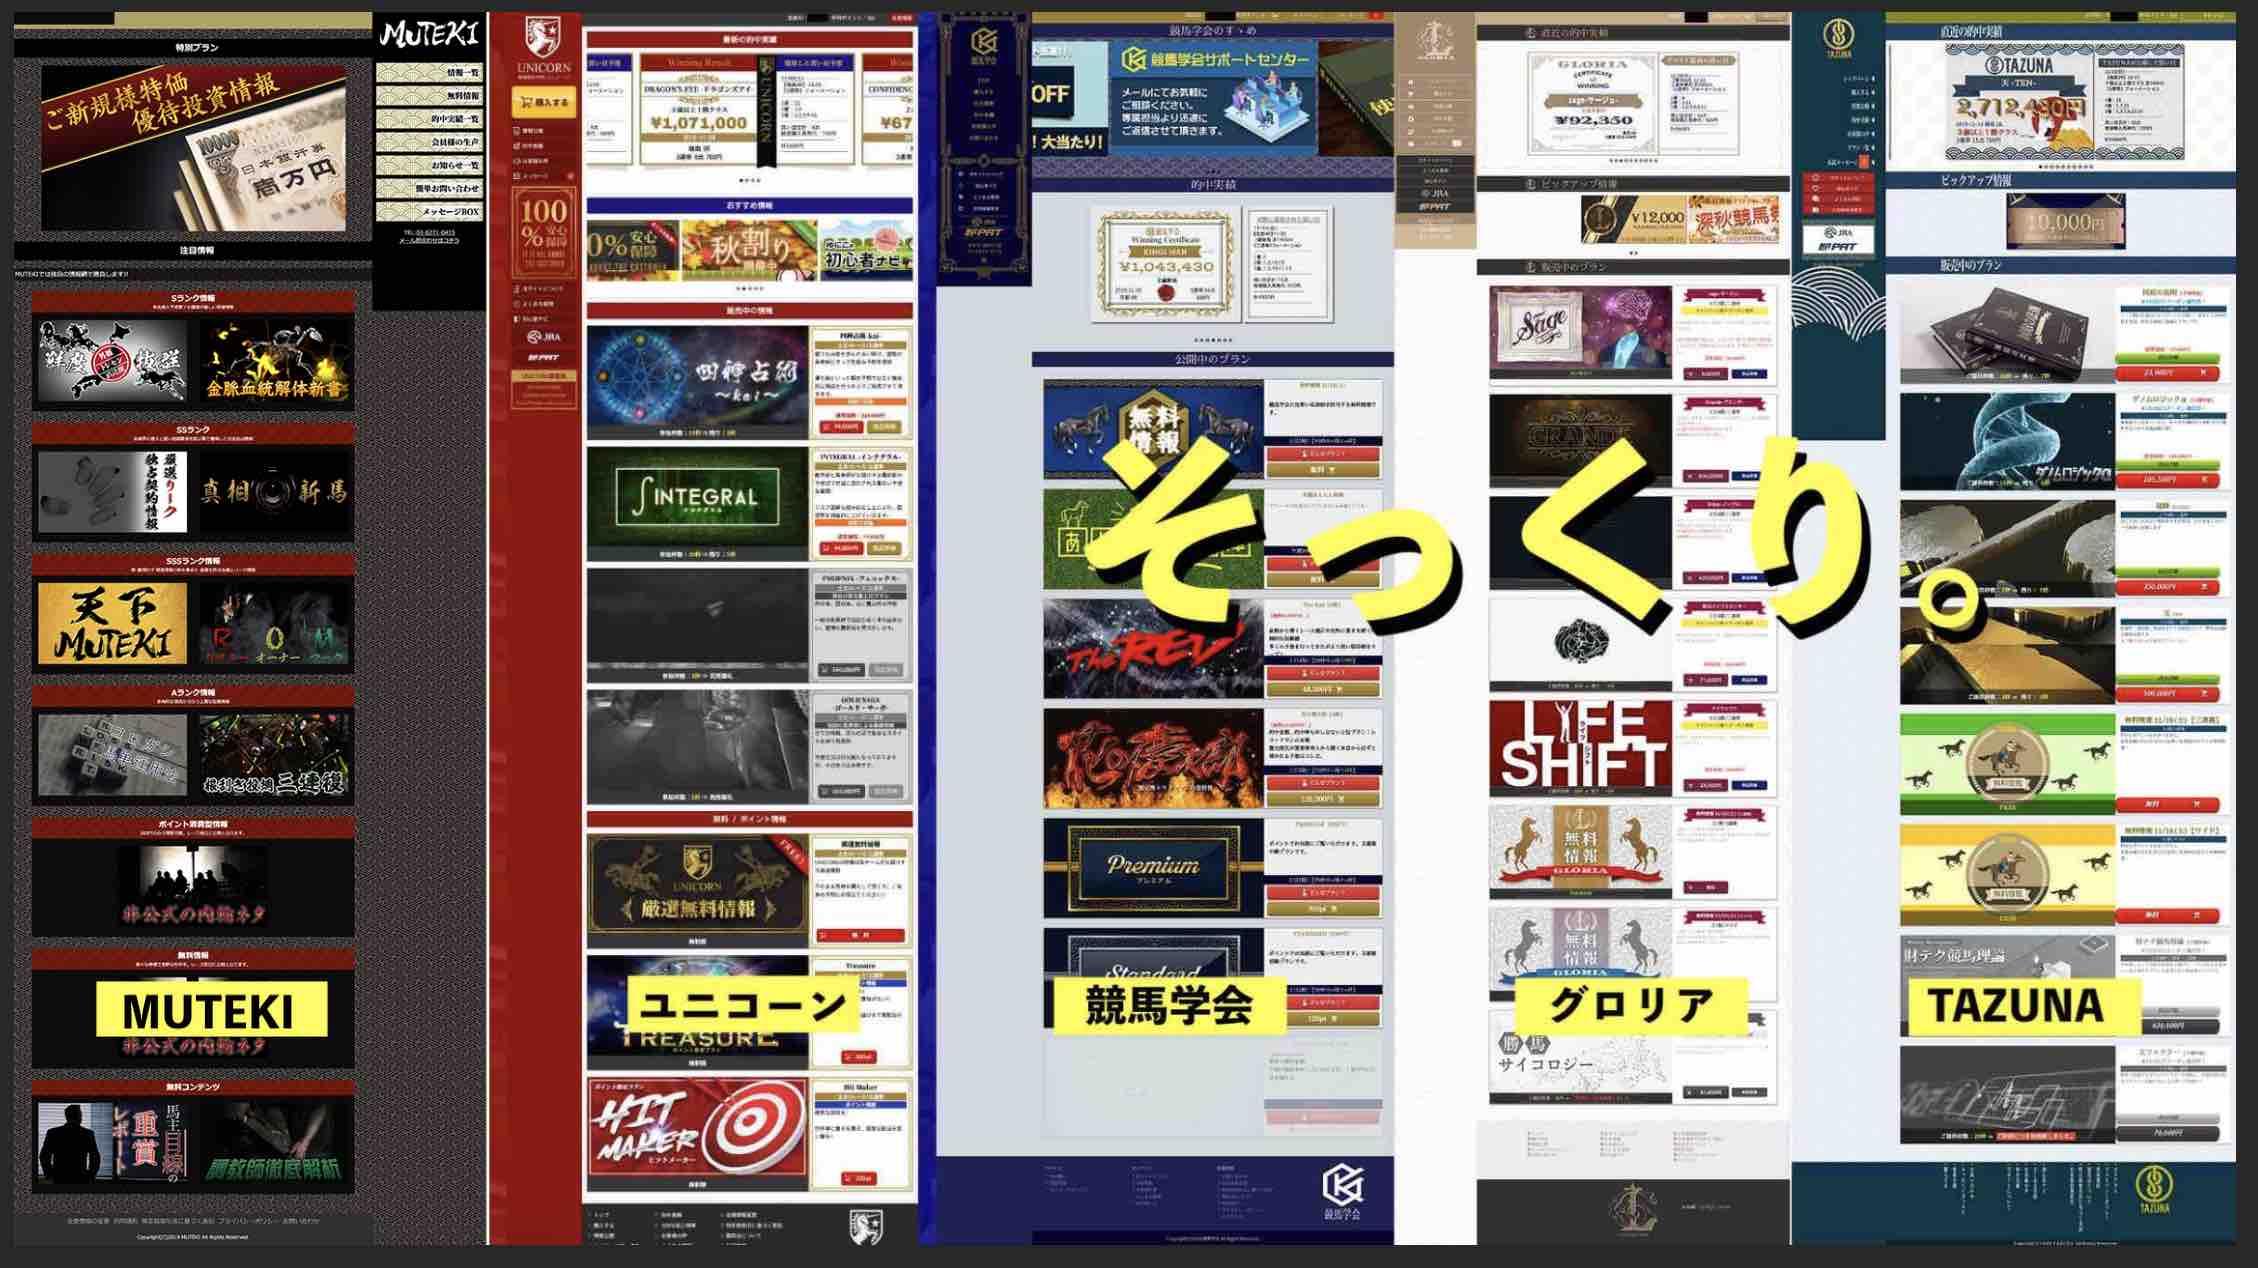 MUTEKIという競馬予想サイトはいつものグループサイトに激似